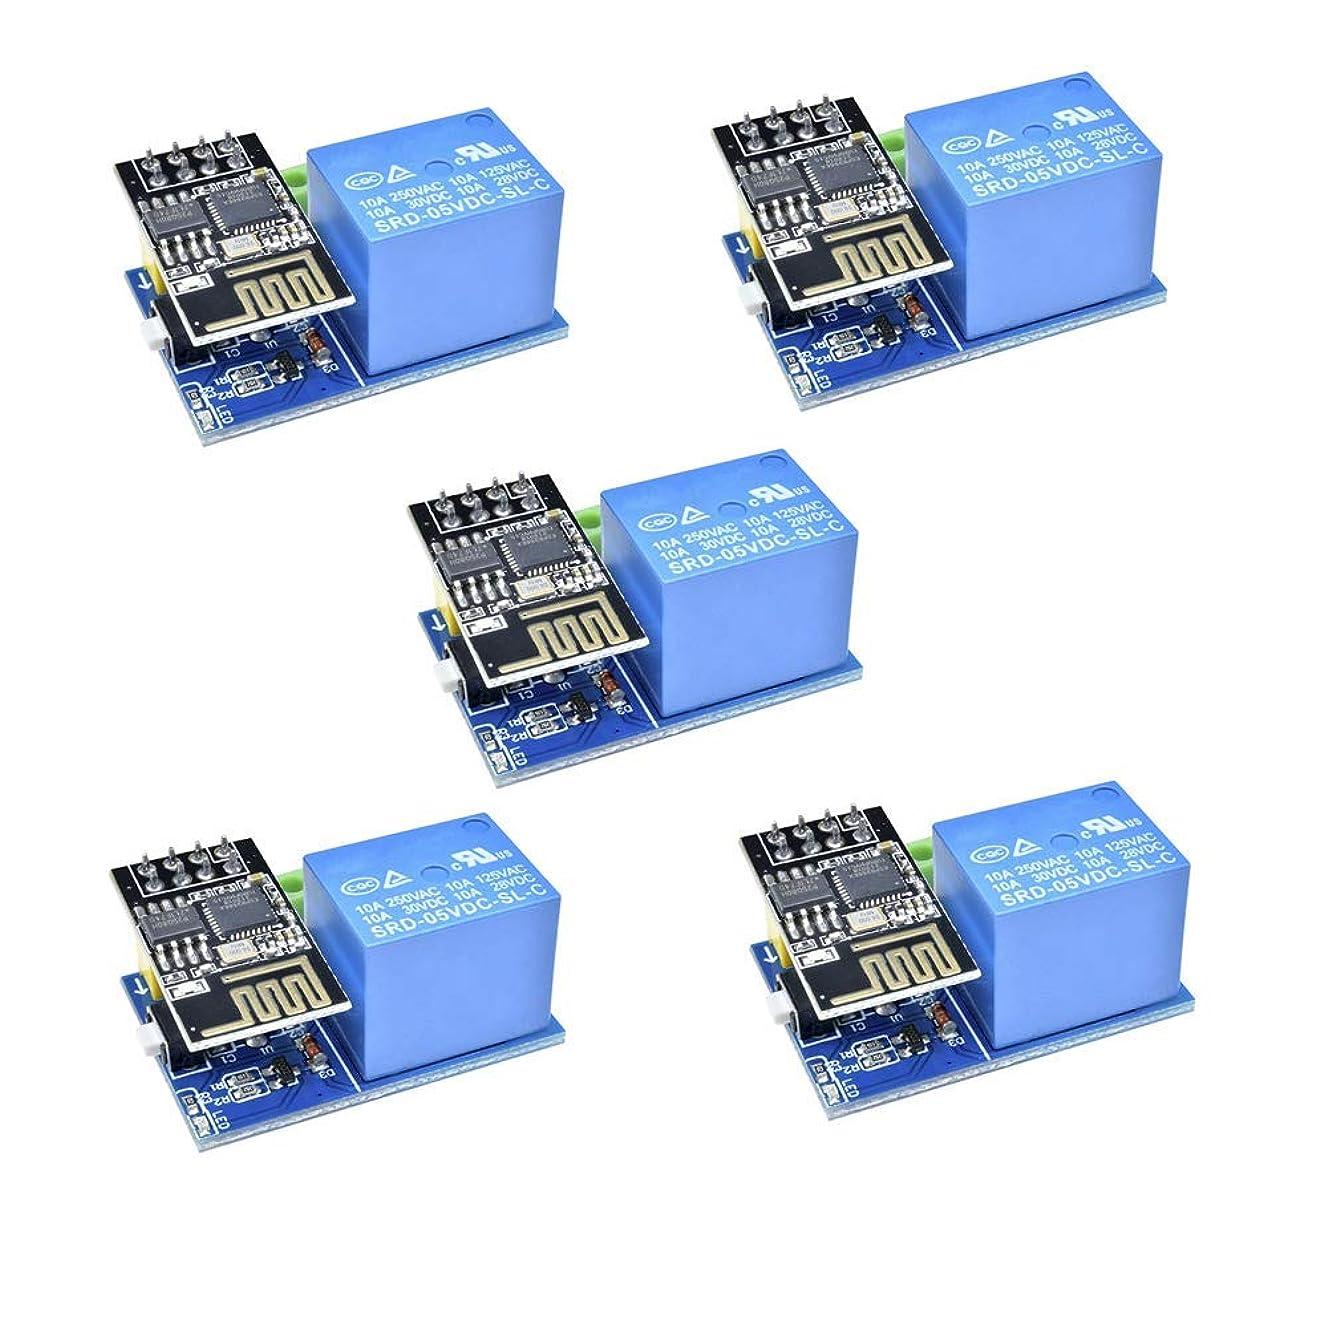 DiyStudio 5個 Wi-Fiリレーモジュール、ESP8266 5V Wifiリレーモジュールリモートコントロールスイッチスマートホーム用電話アプリ Wifiコントロールモジュール